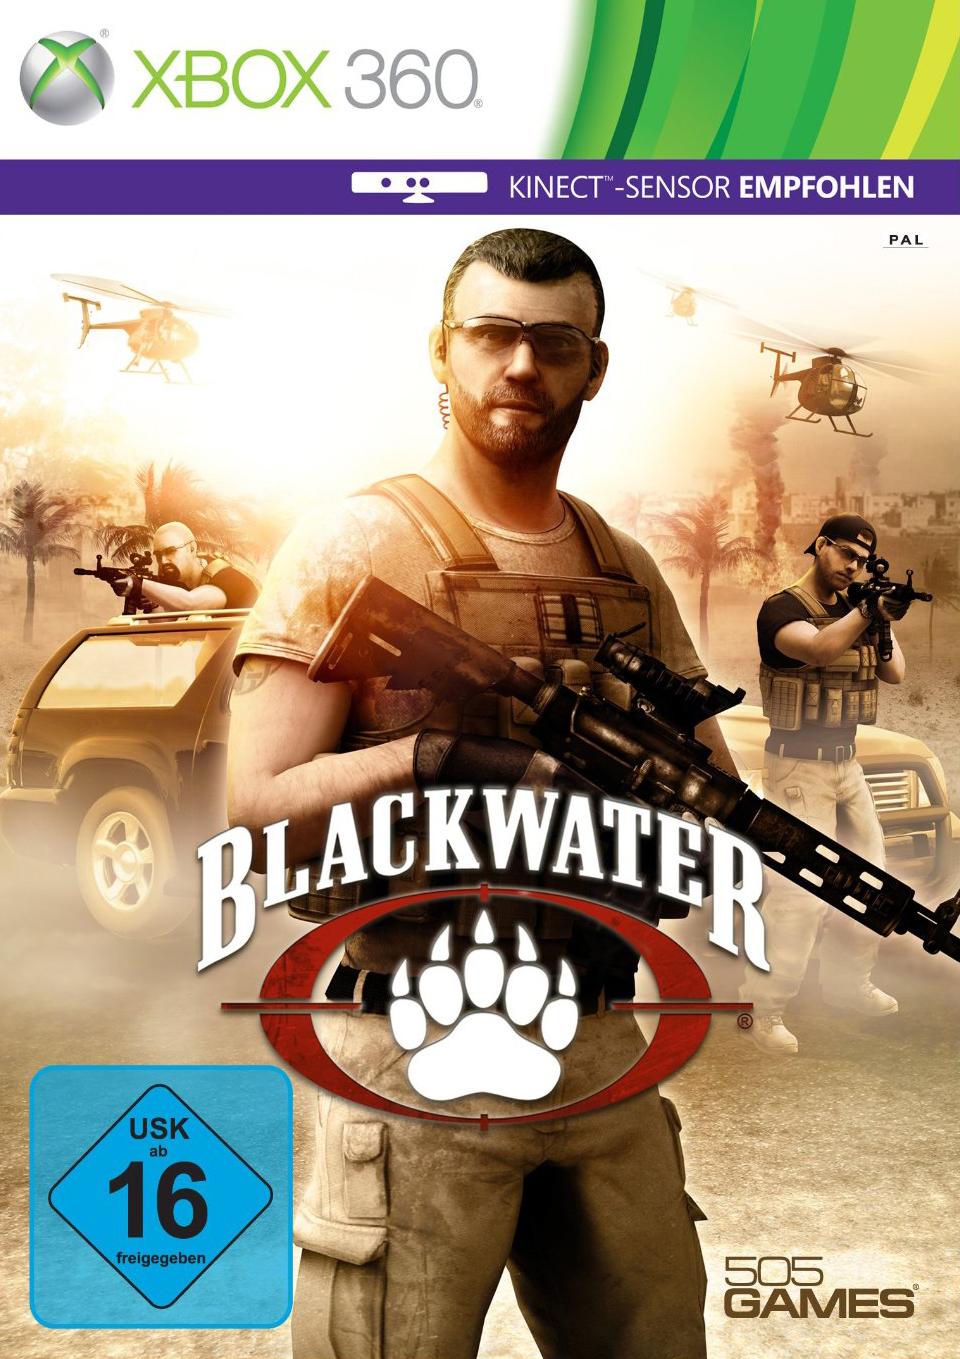 https://img.webme.com/pic/x/xbox360team/blackwater.jpg